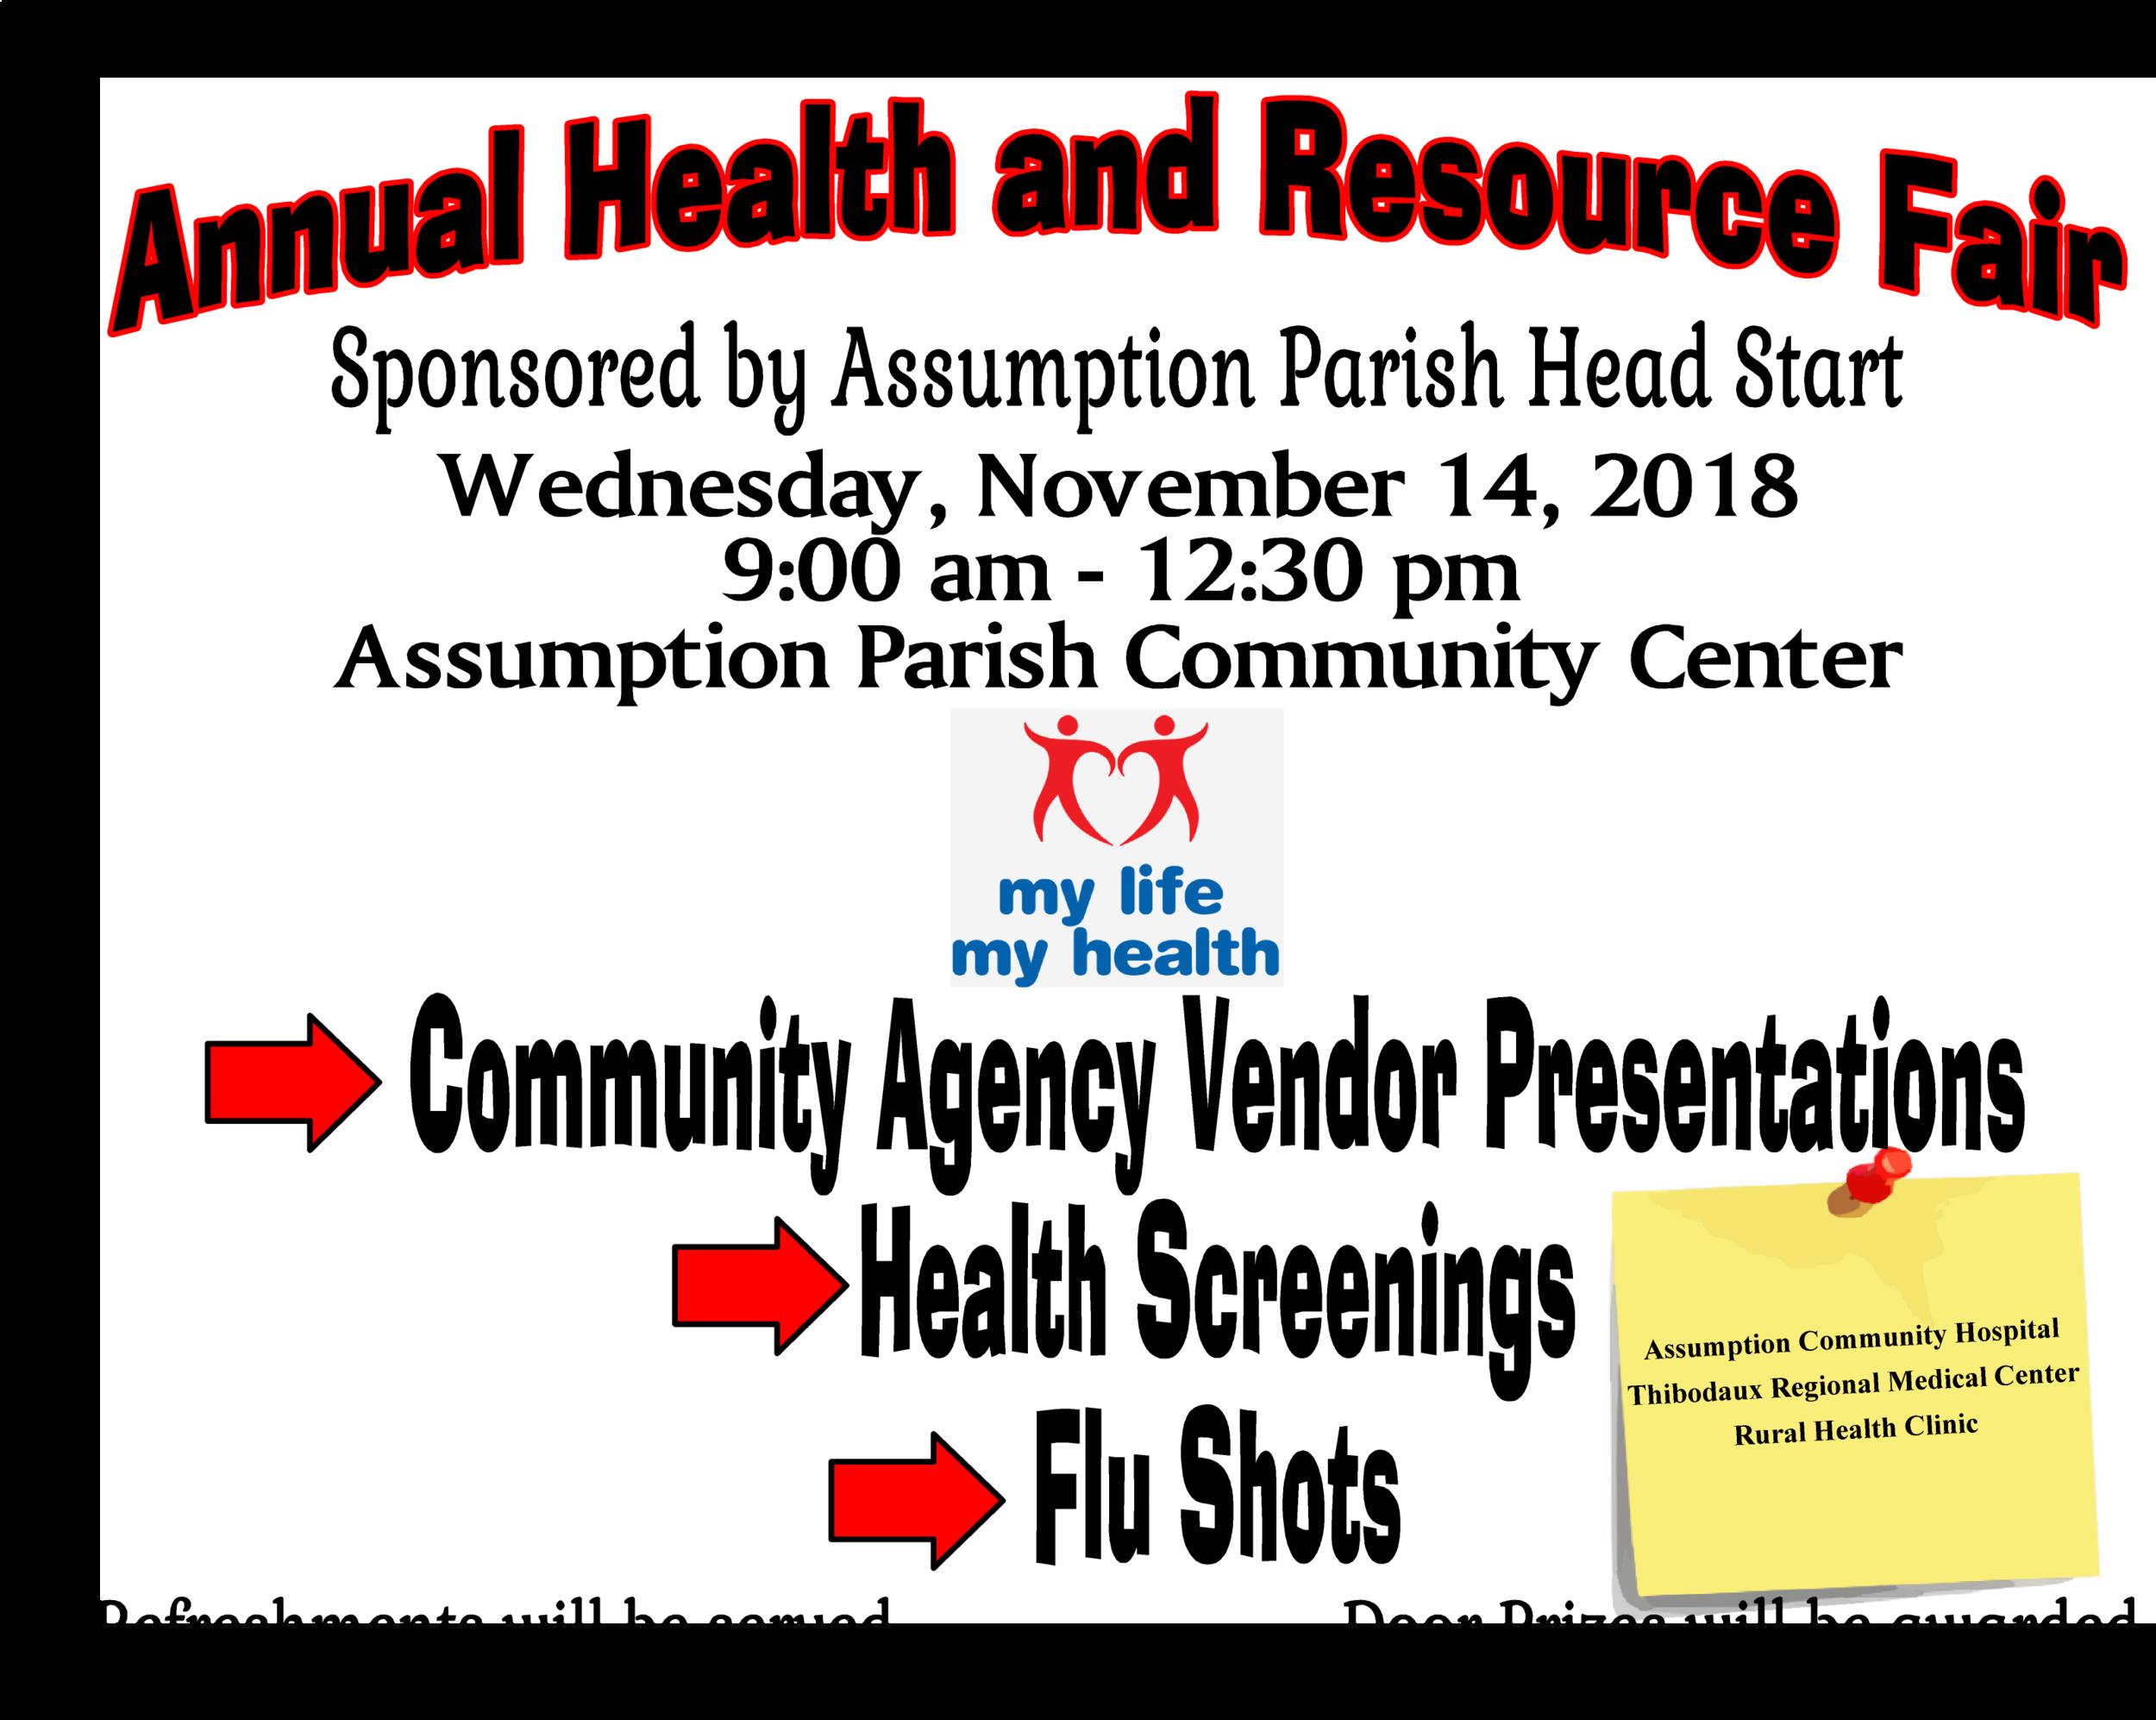 Health-Fair-Flyer-Community.png